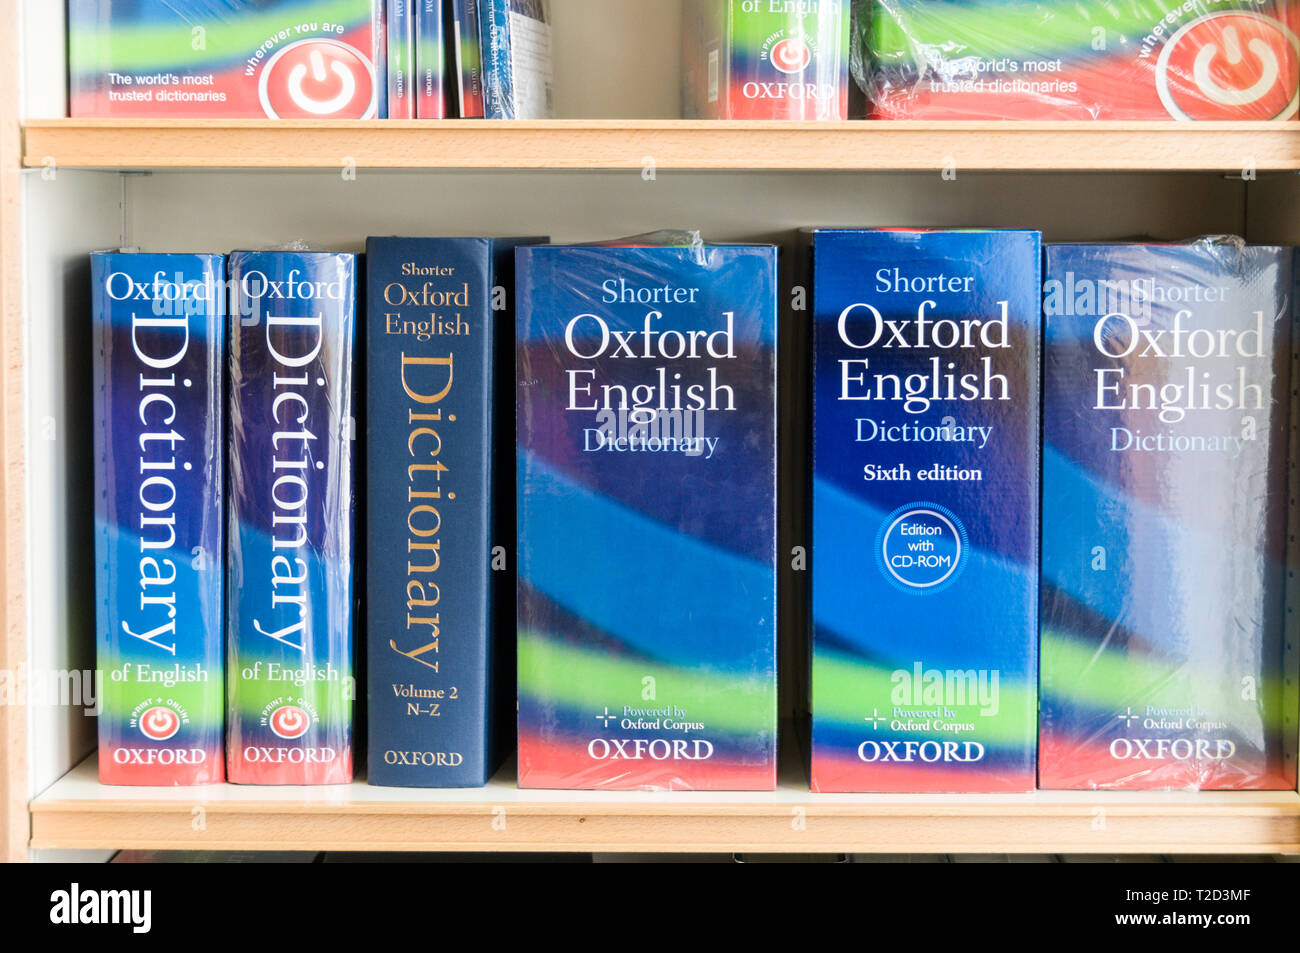 Oxford English Dictionary Stock Photos & Oxford English